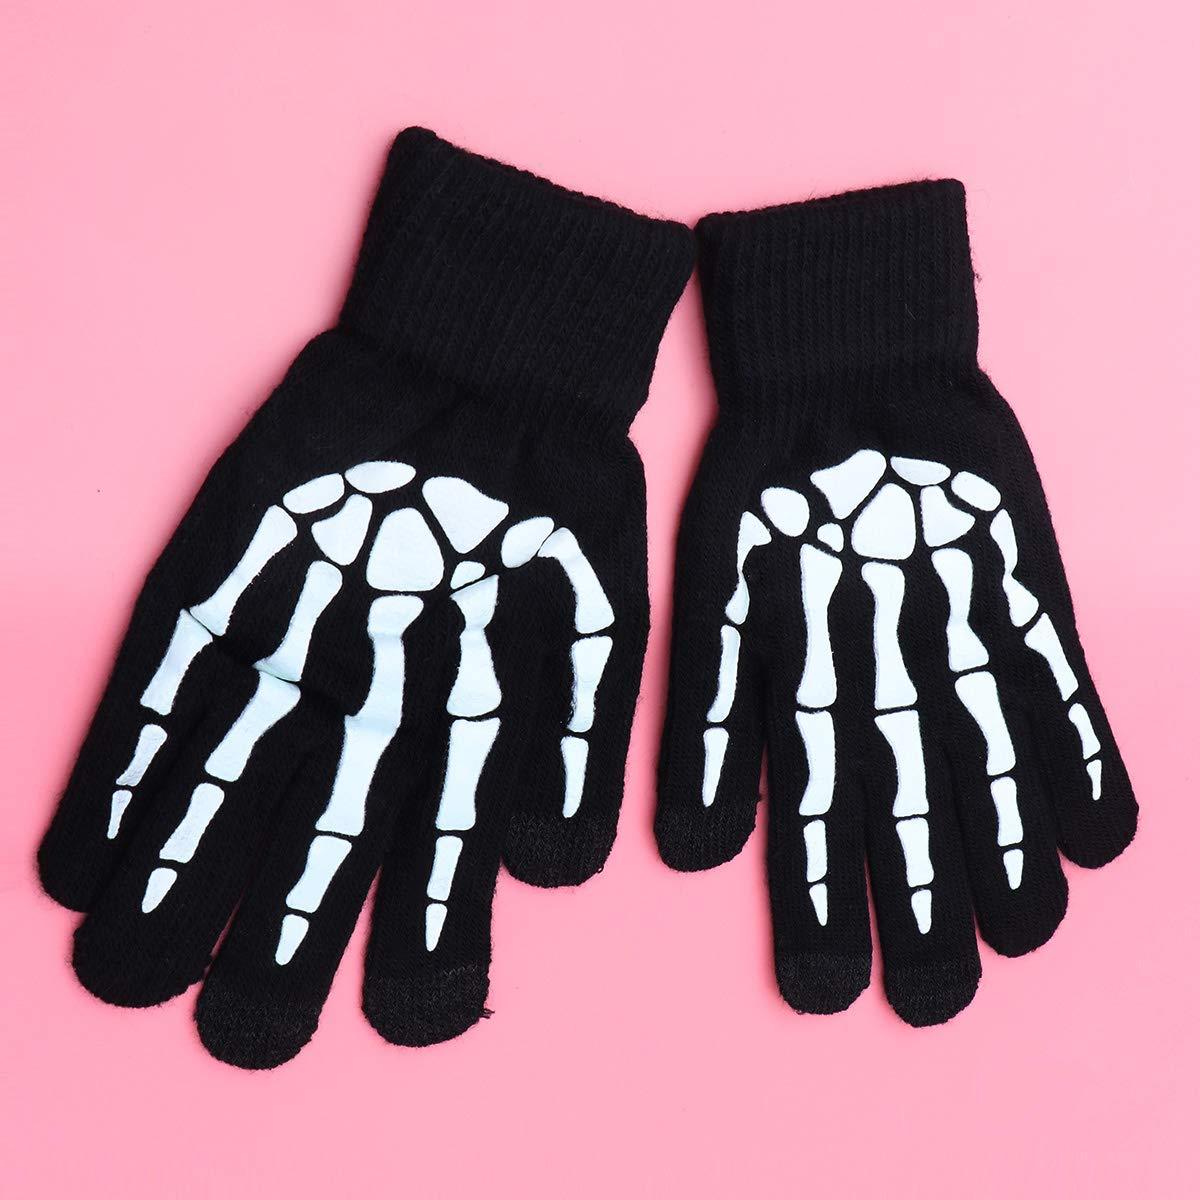 Nero Amosfun Guanti da Diavolo da Uomo Knitting Skeleton Claw Glove